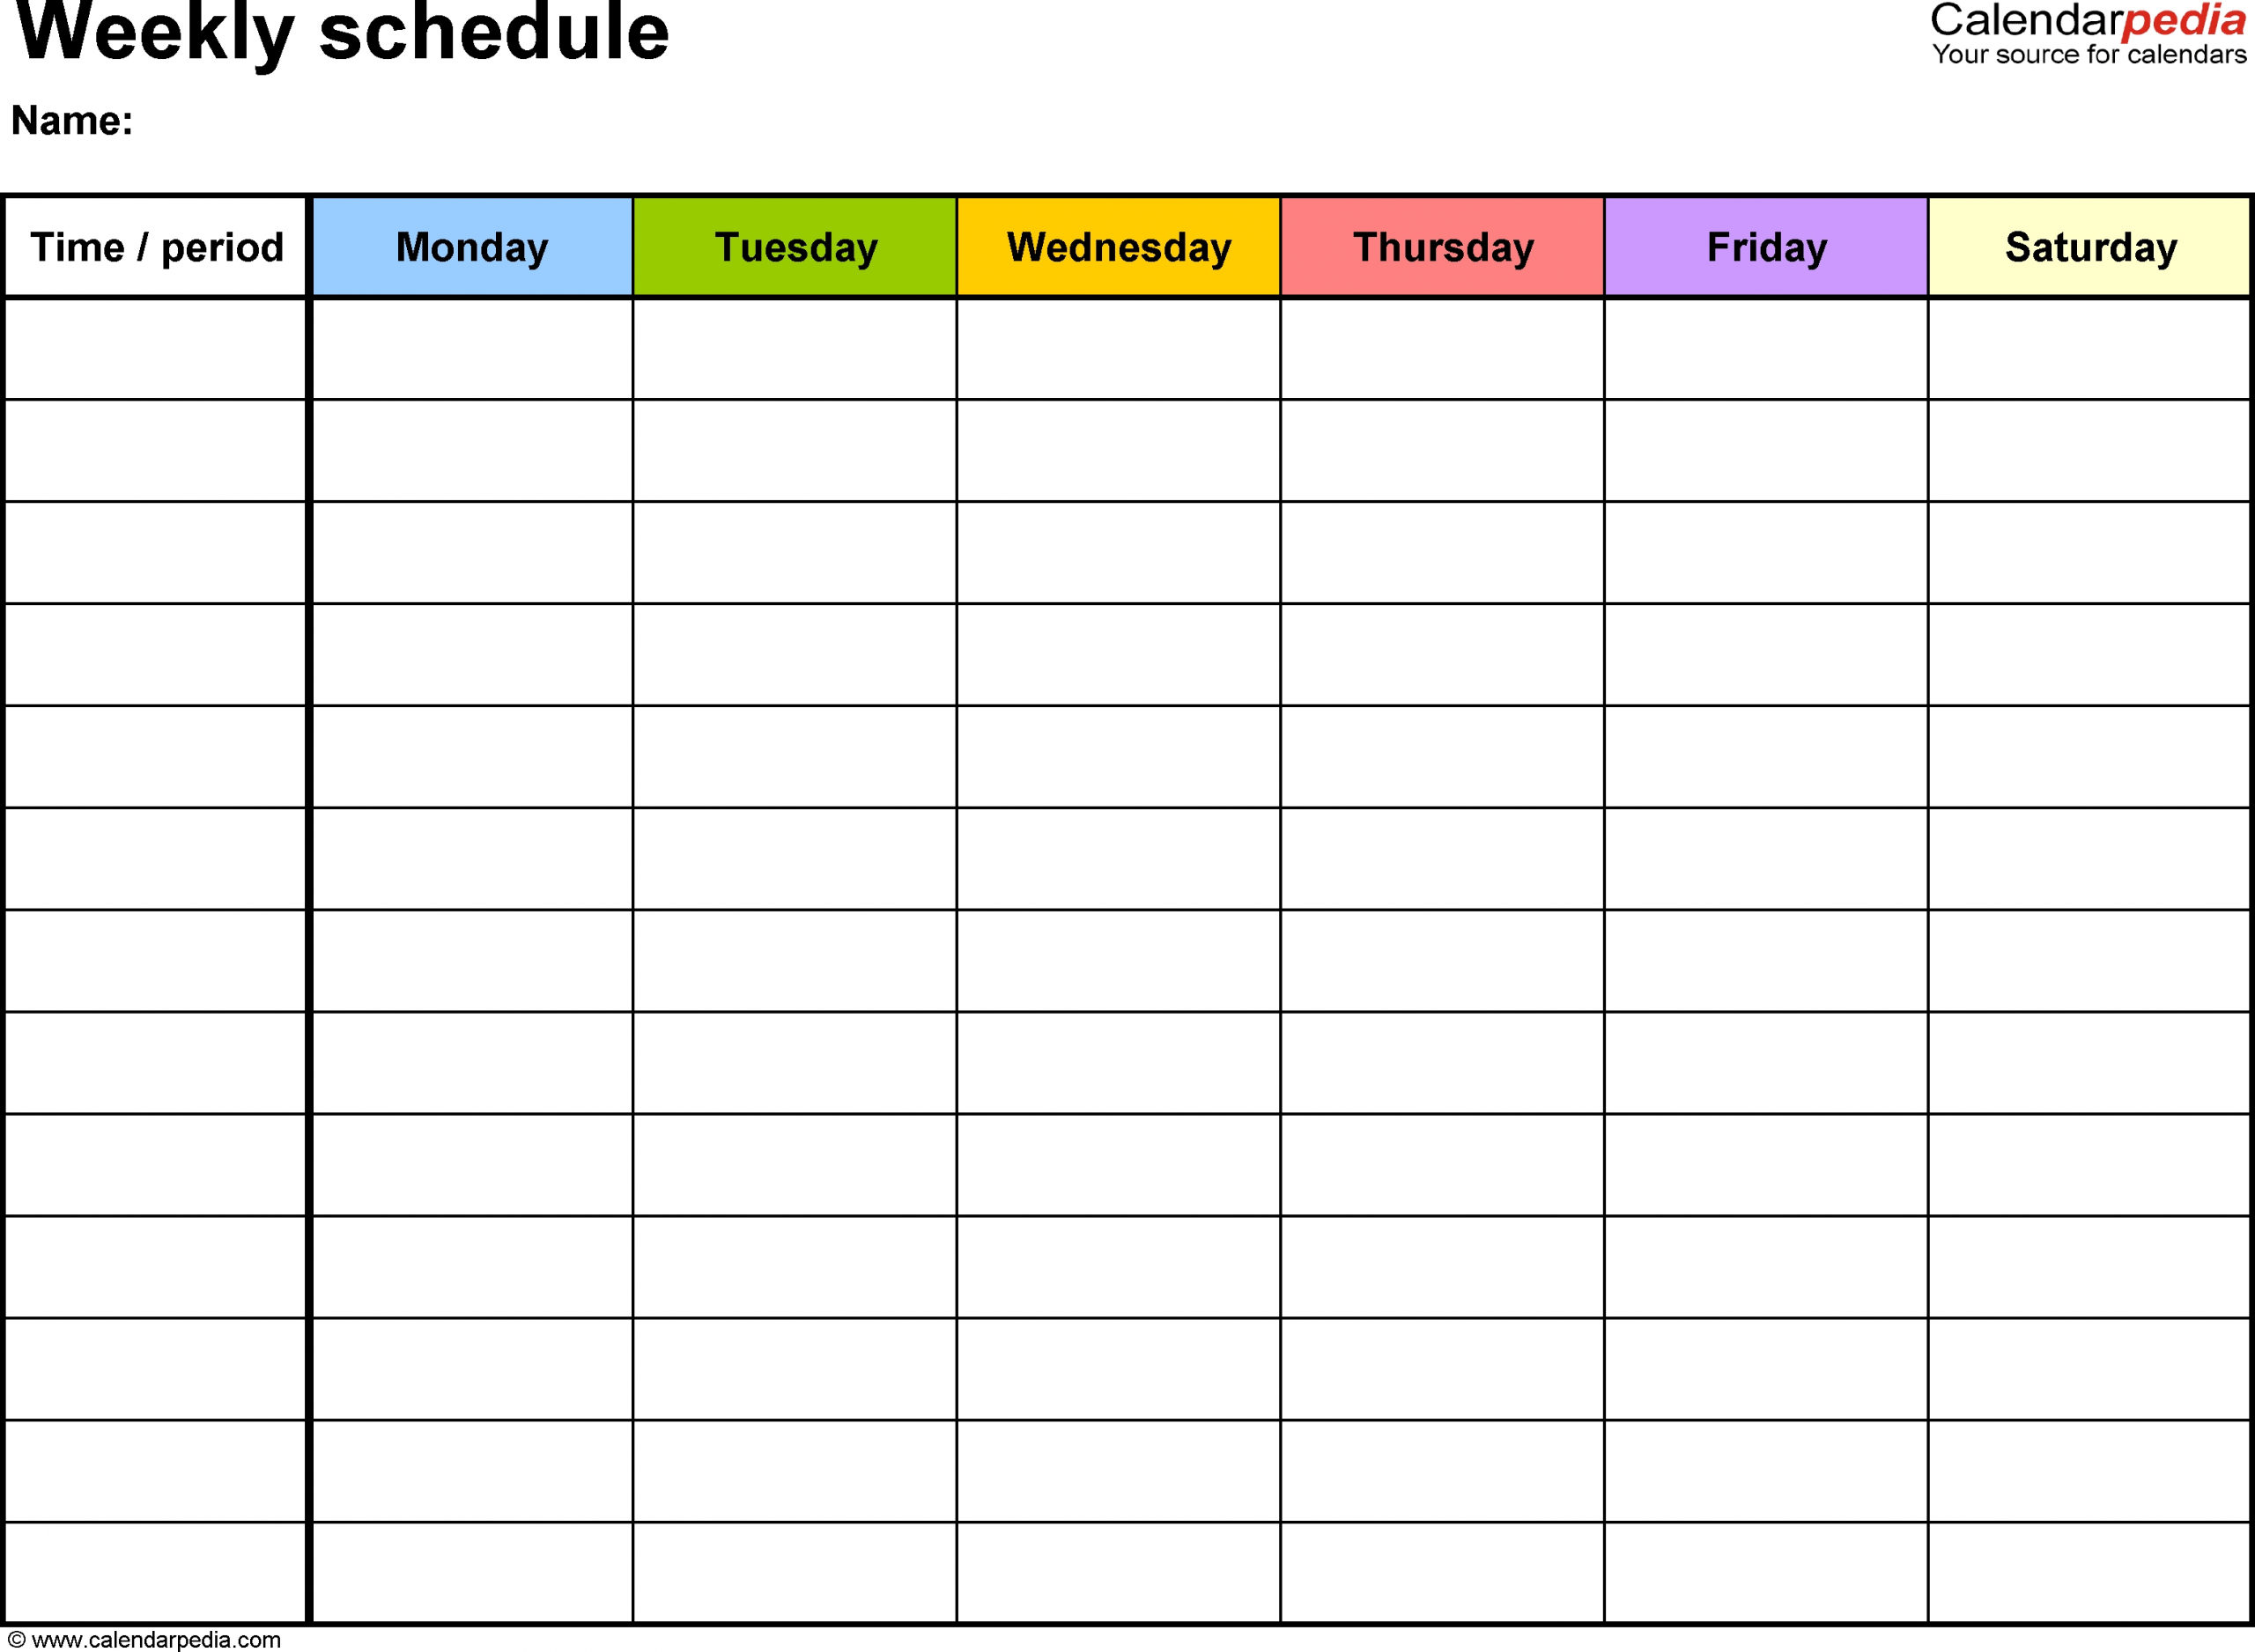 Template Monday To Friday | Calendar Template Printable Mondaythru Friday Calenar Free